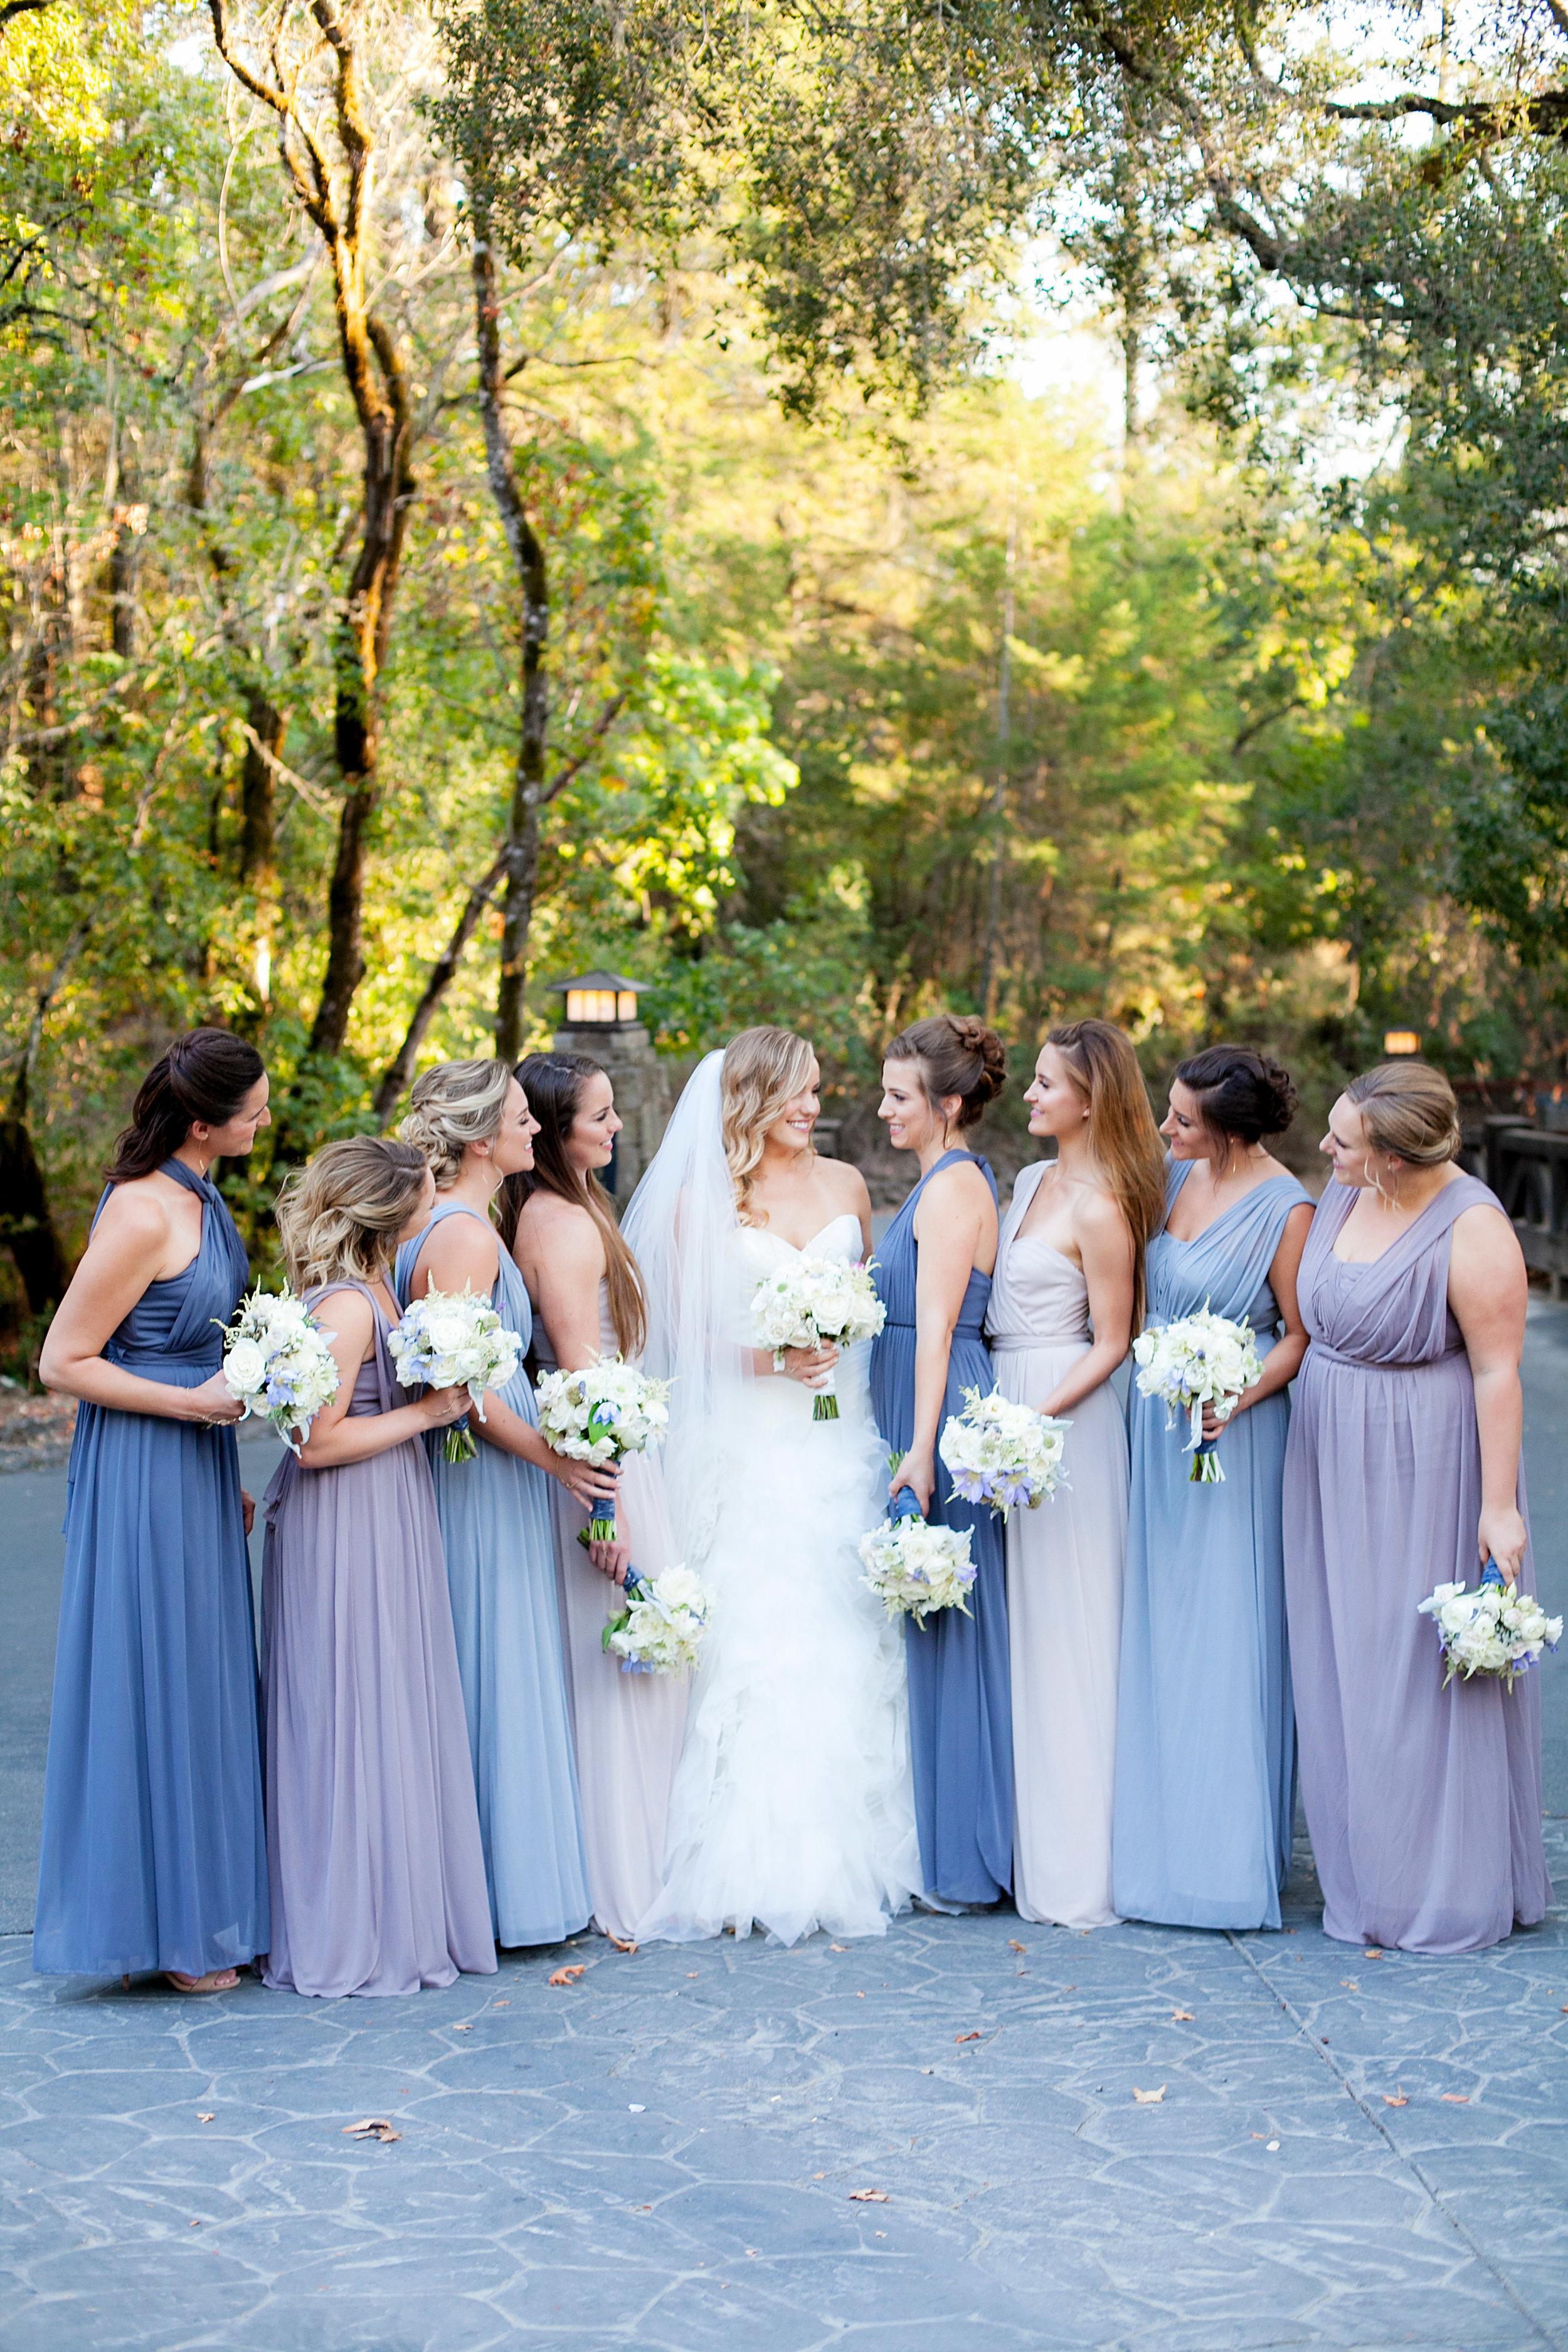 Best-Napa-Wedding-Venues-Calistoga-Ranch-2.jpg